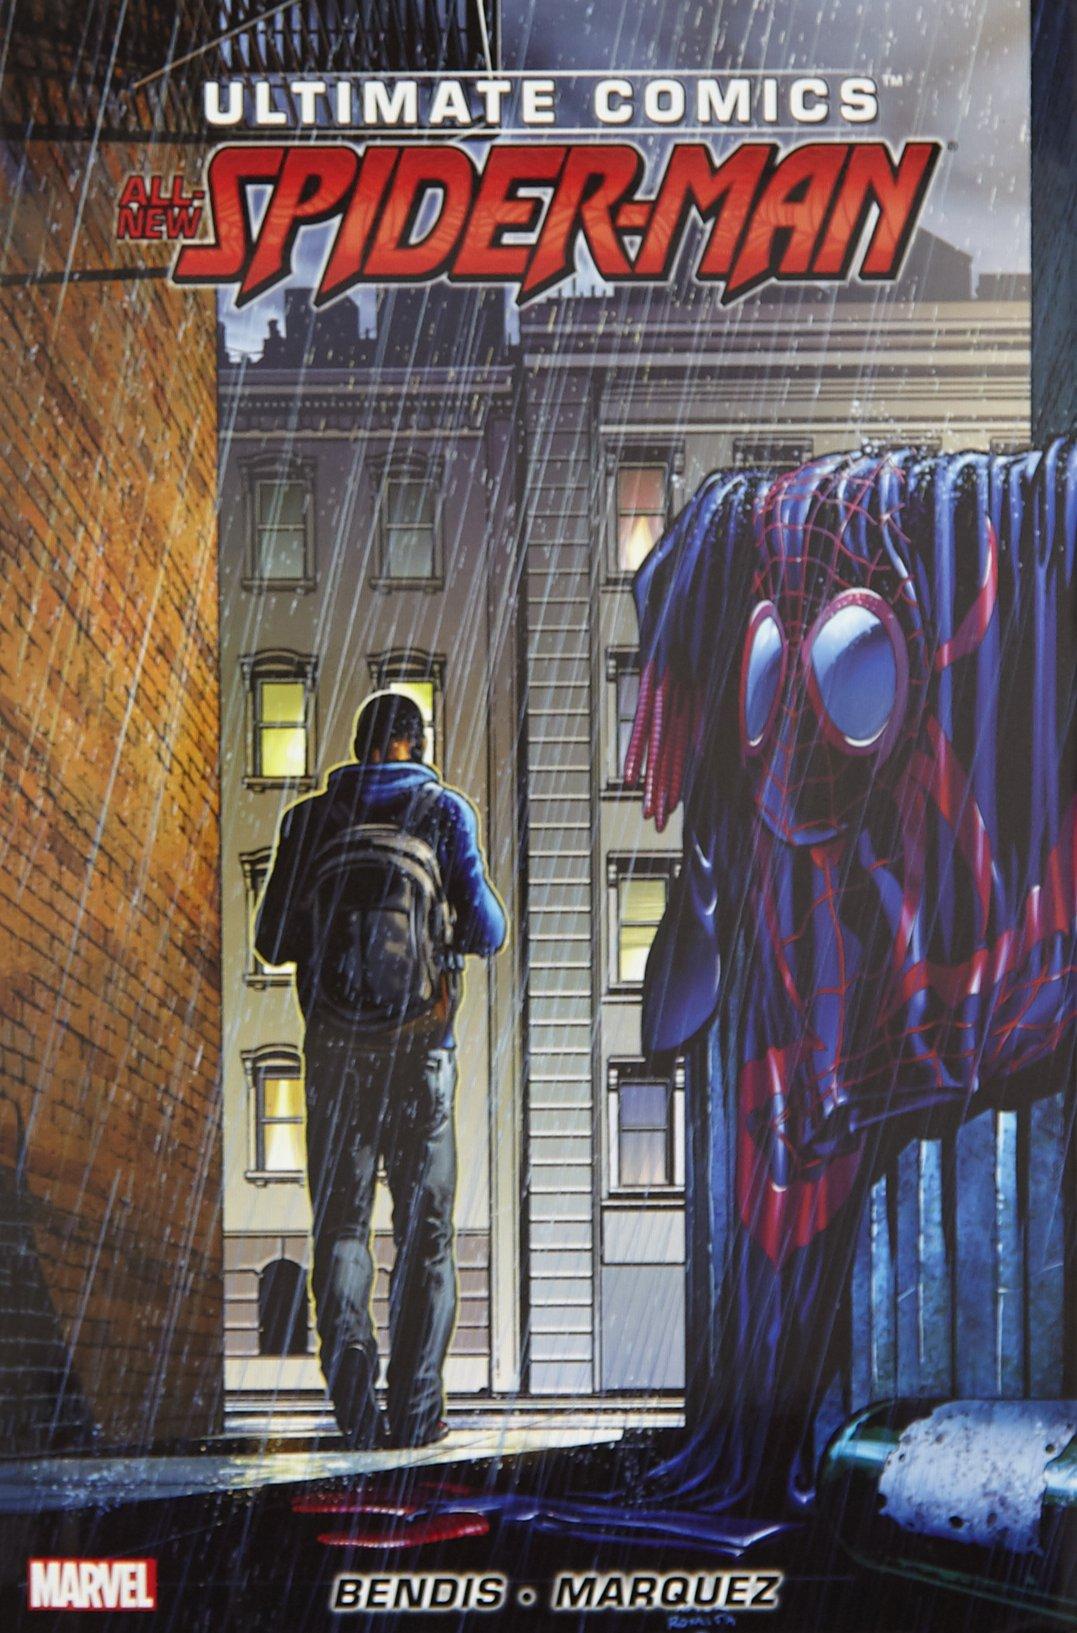 Ultimate Comics Spider-Man by Brian Michael Bendis Volume 5 ebook